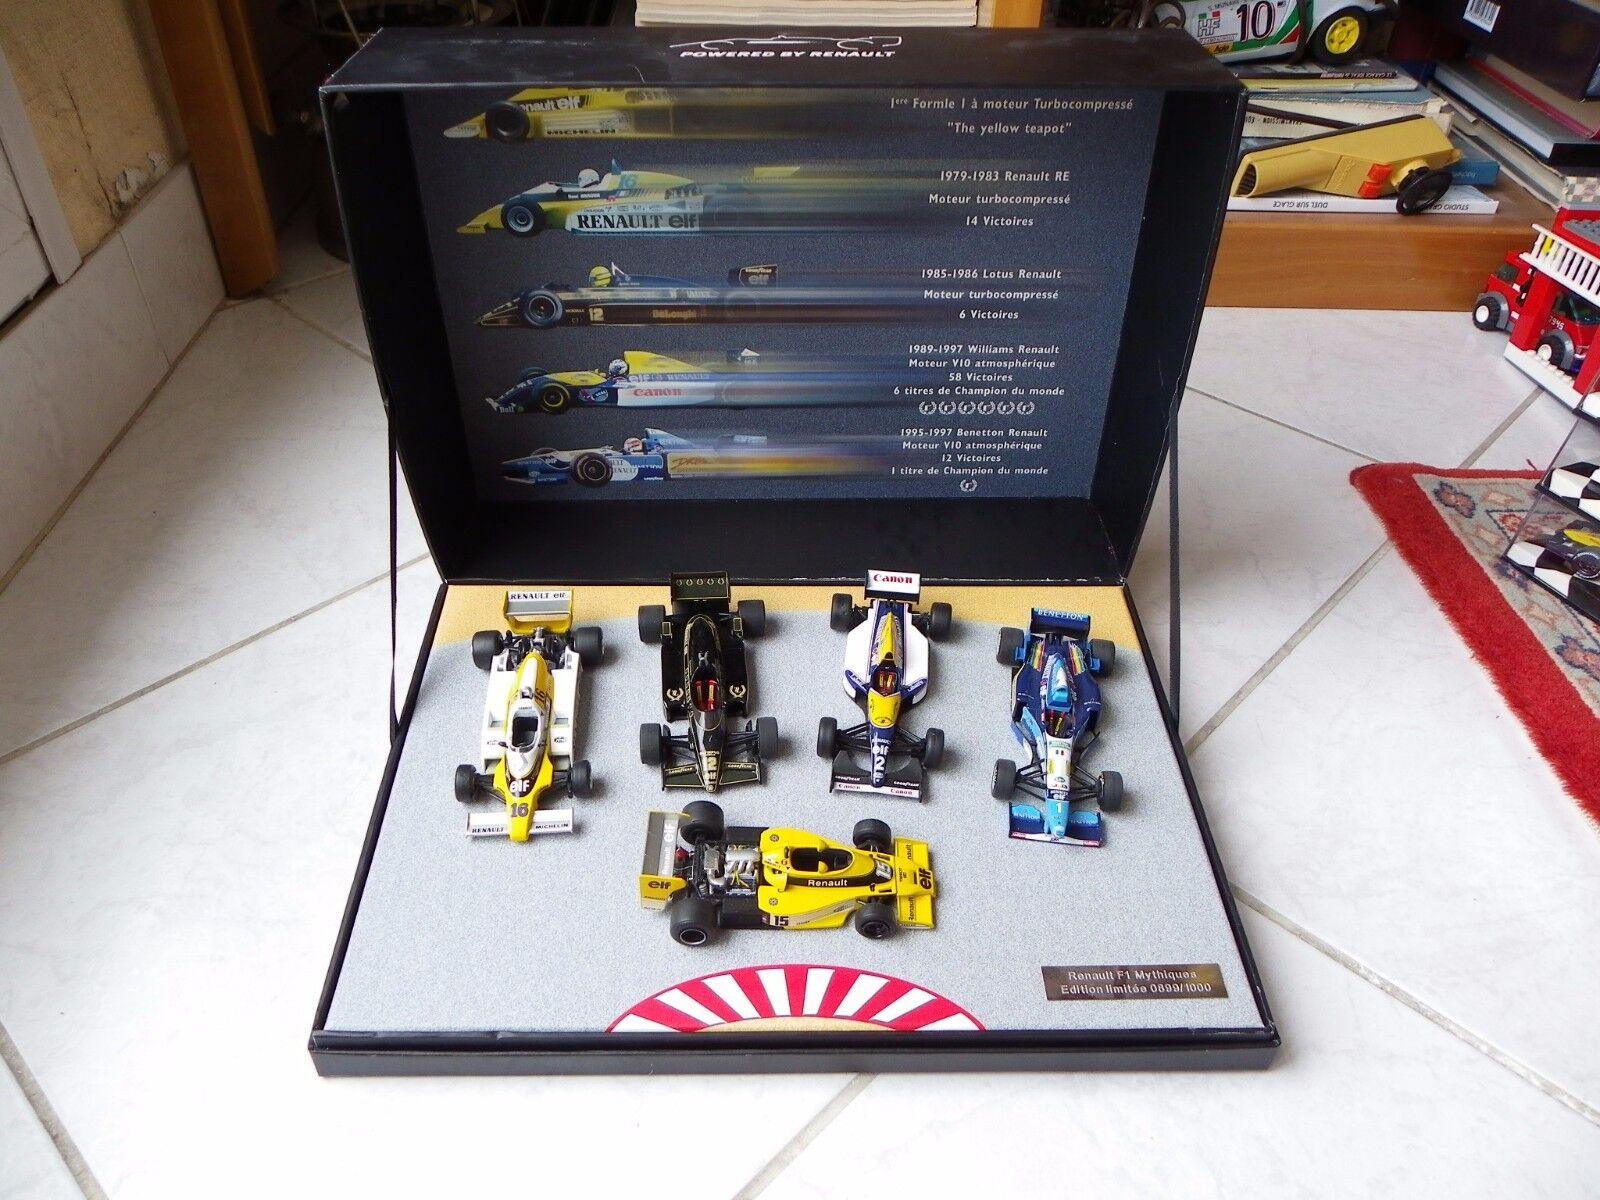 Schatulle Renault mythische Lotus Williams Benetton Senna Prost 1 43 F1 Formel 1  | Innovation